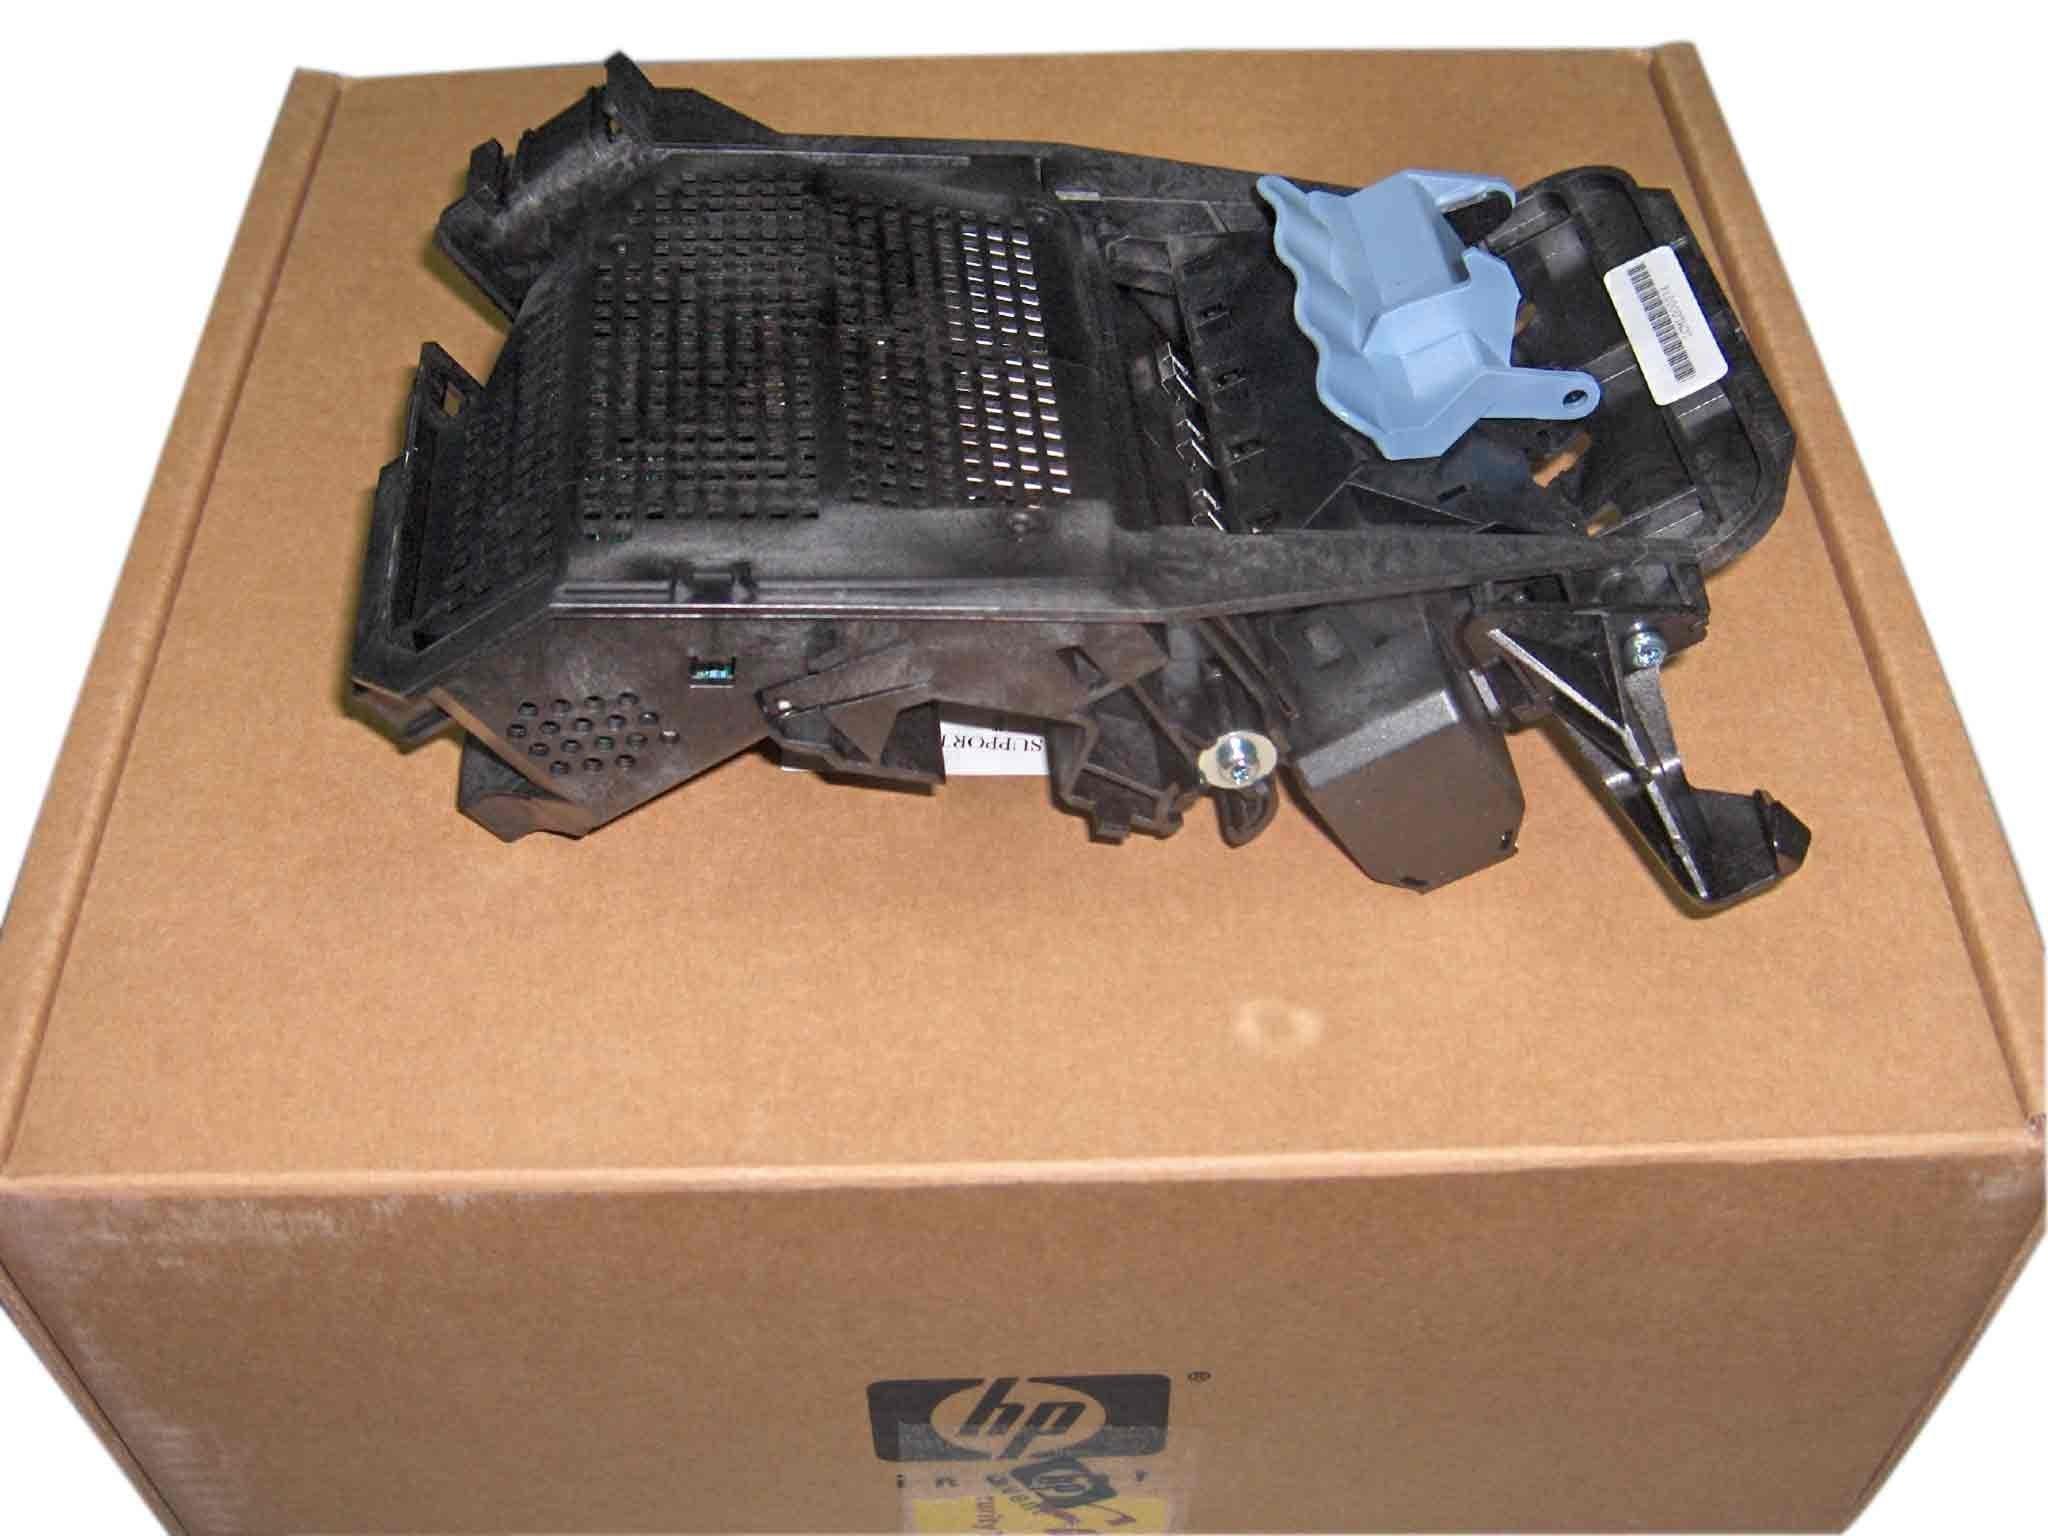 HP DesignJet 500 800 Carriage Assy C7769-60151 60007